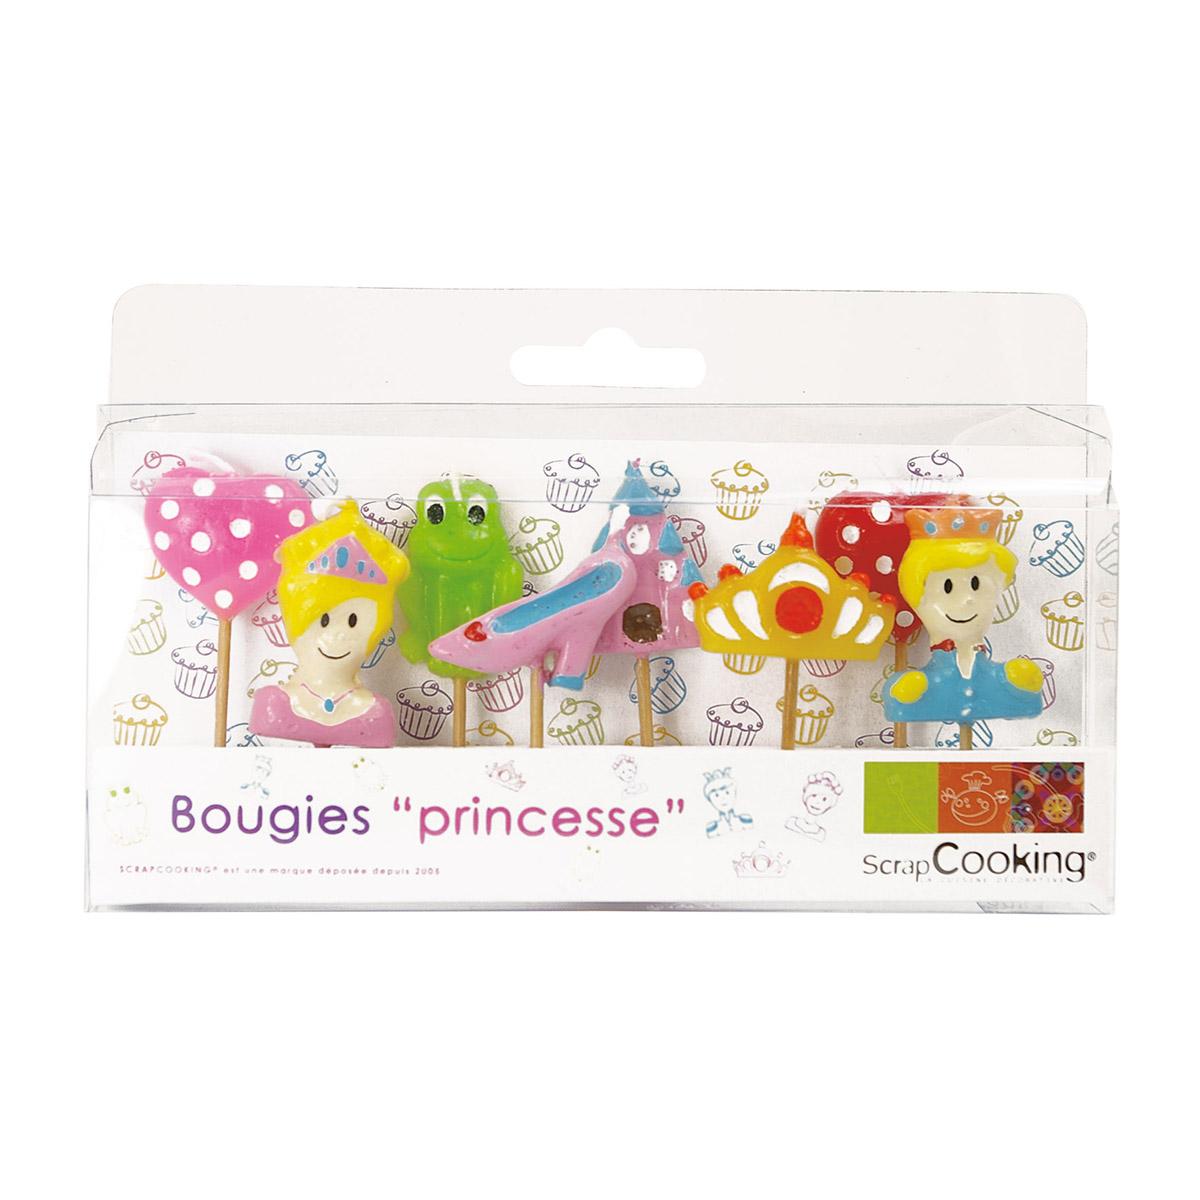 Image du produit 8 bougies princesse - Scrapcooking